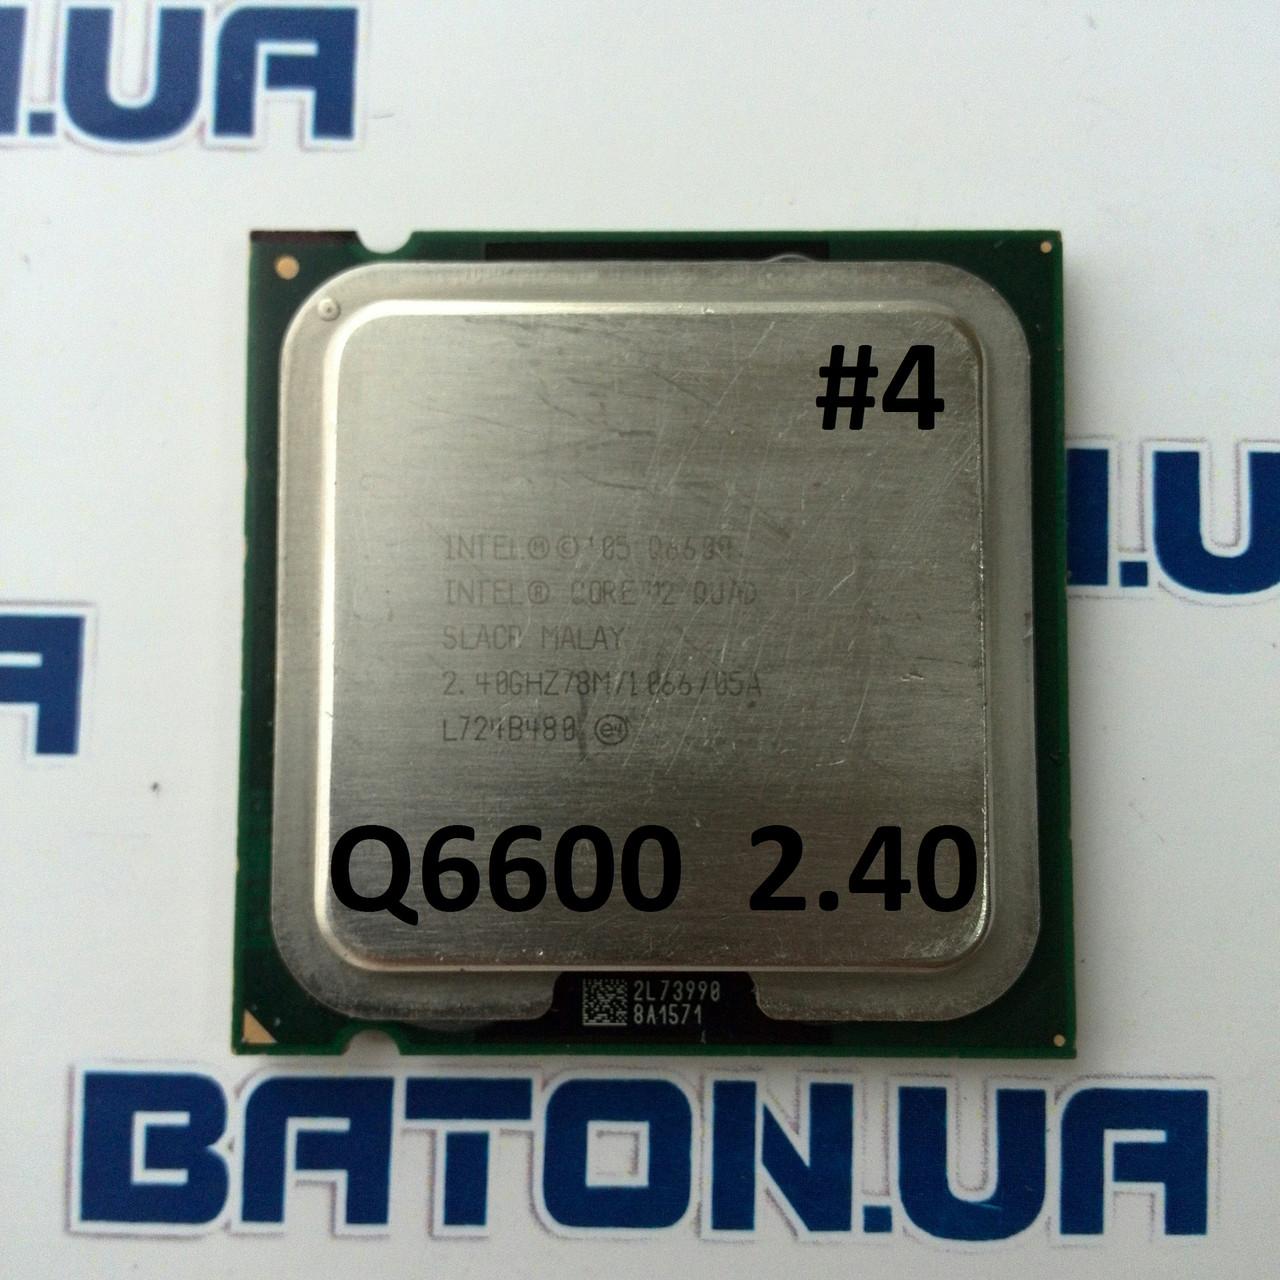 Процессор ЛОТ#4 Intel® Core™2 Quad Q6600 2.4GHz 8M Cache 1066 MHz FSB Soket 775 Гарантия + Термопаста